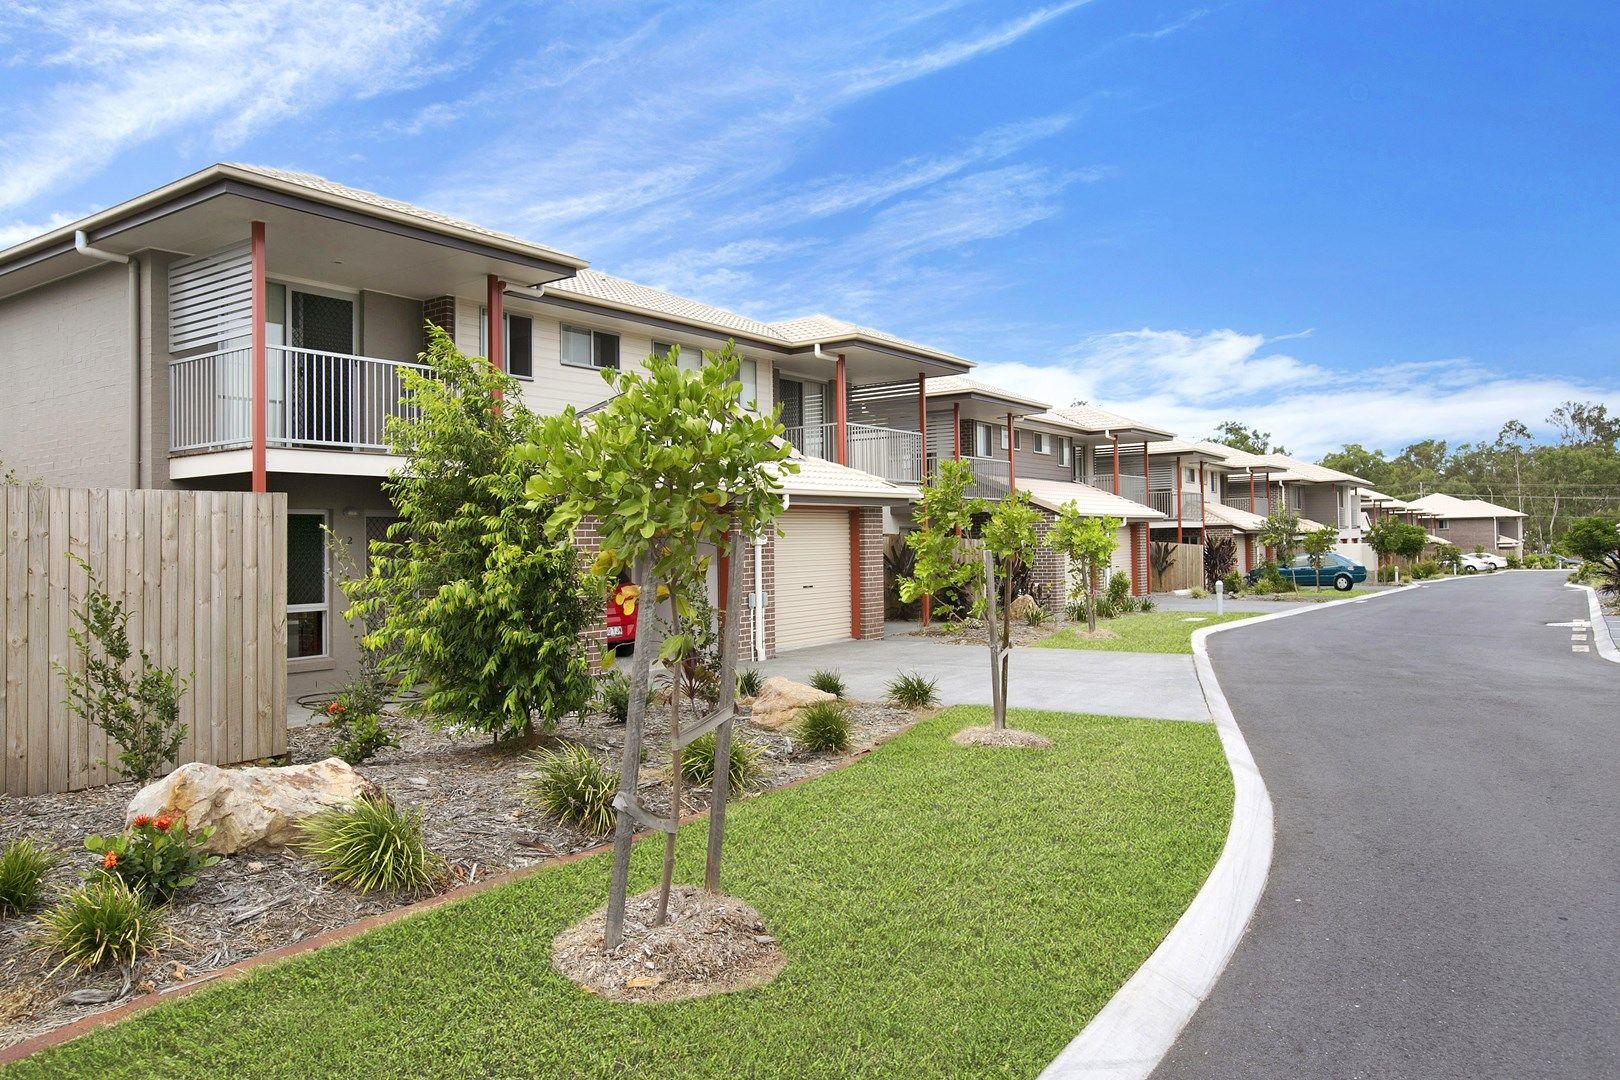 17-27 Mulgrave  Road, Marsden QLD 4132, Image 0